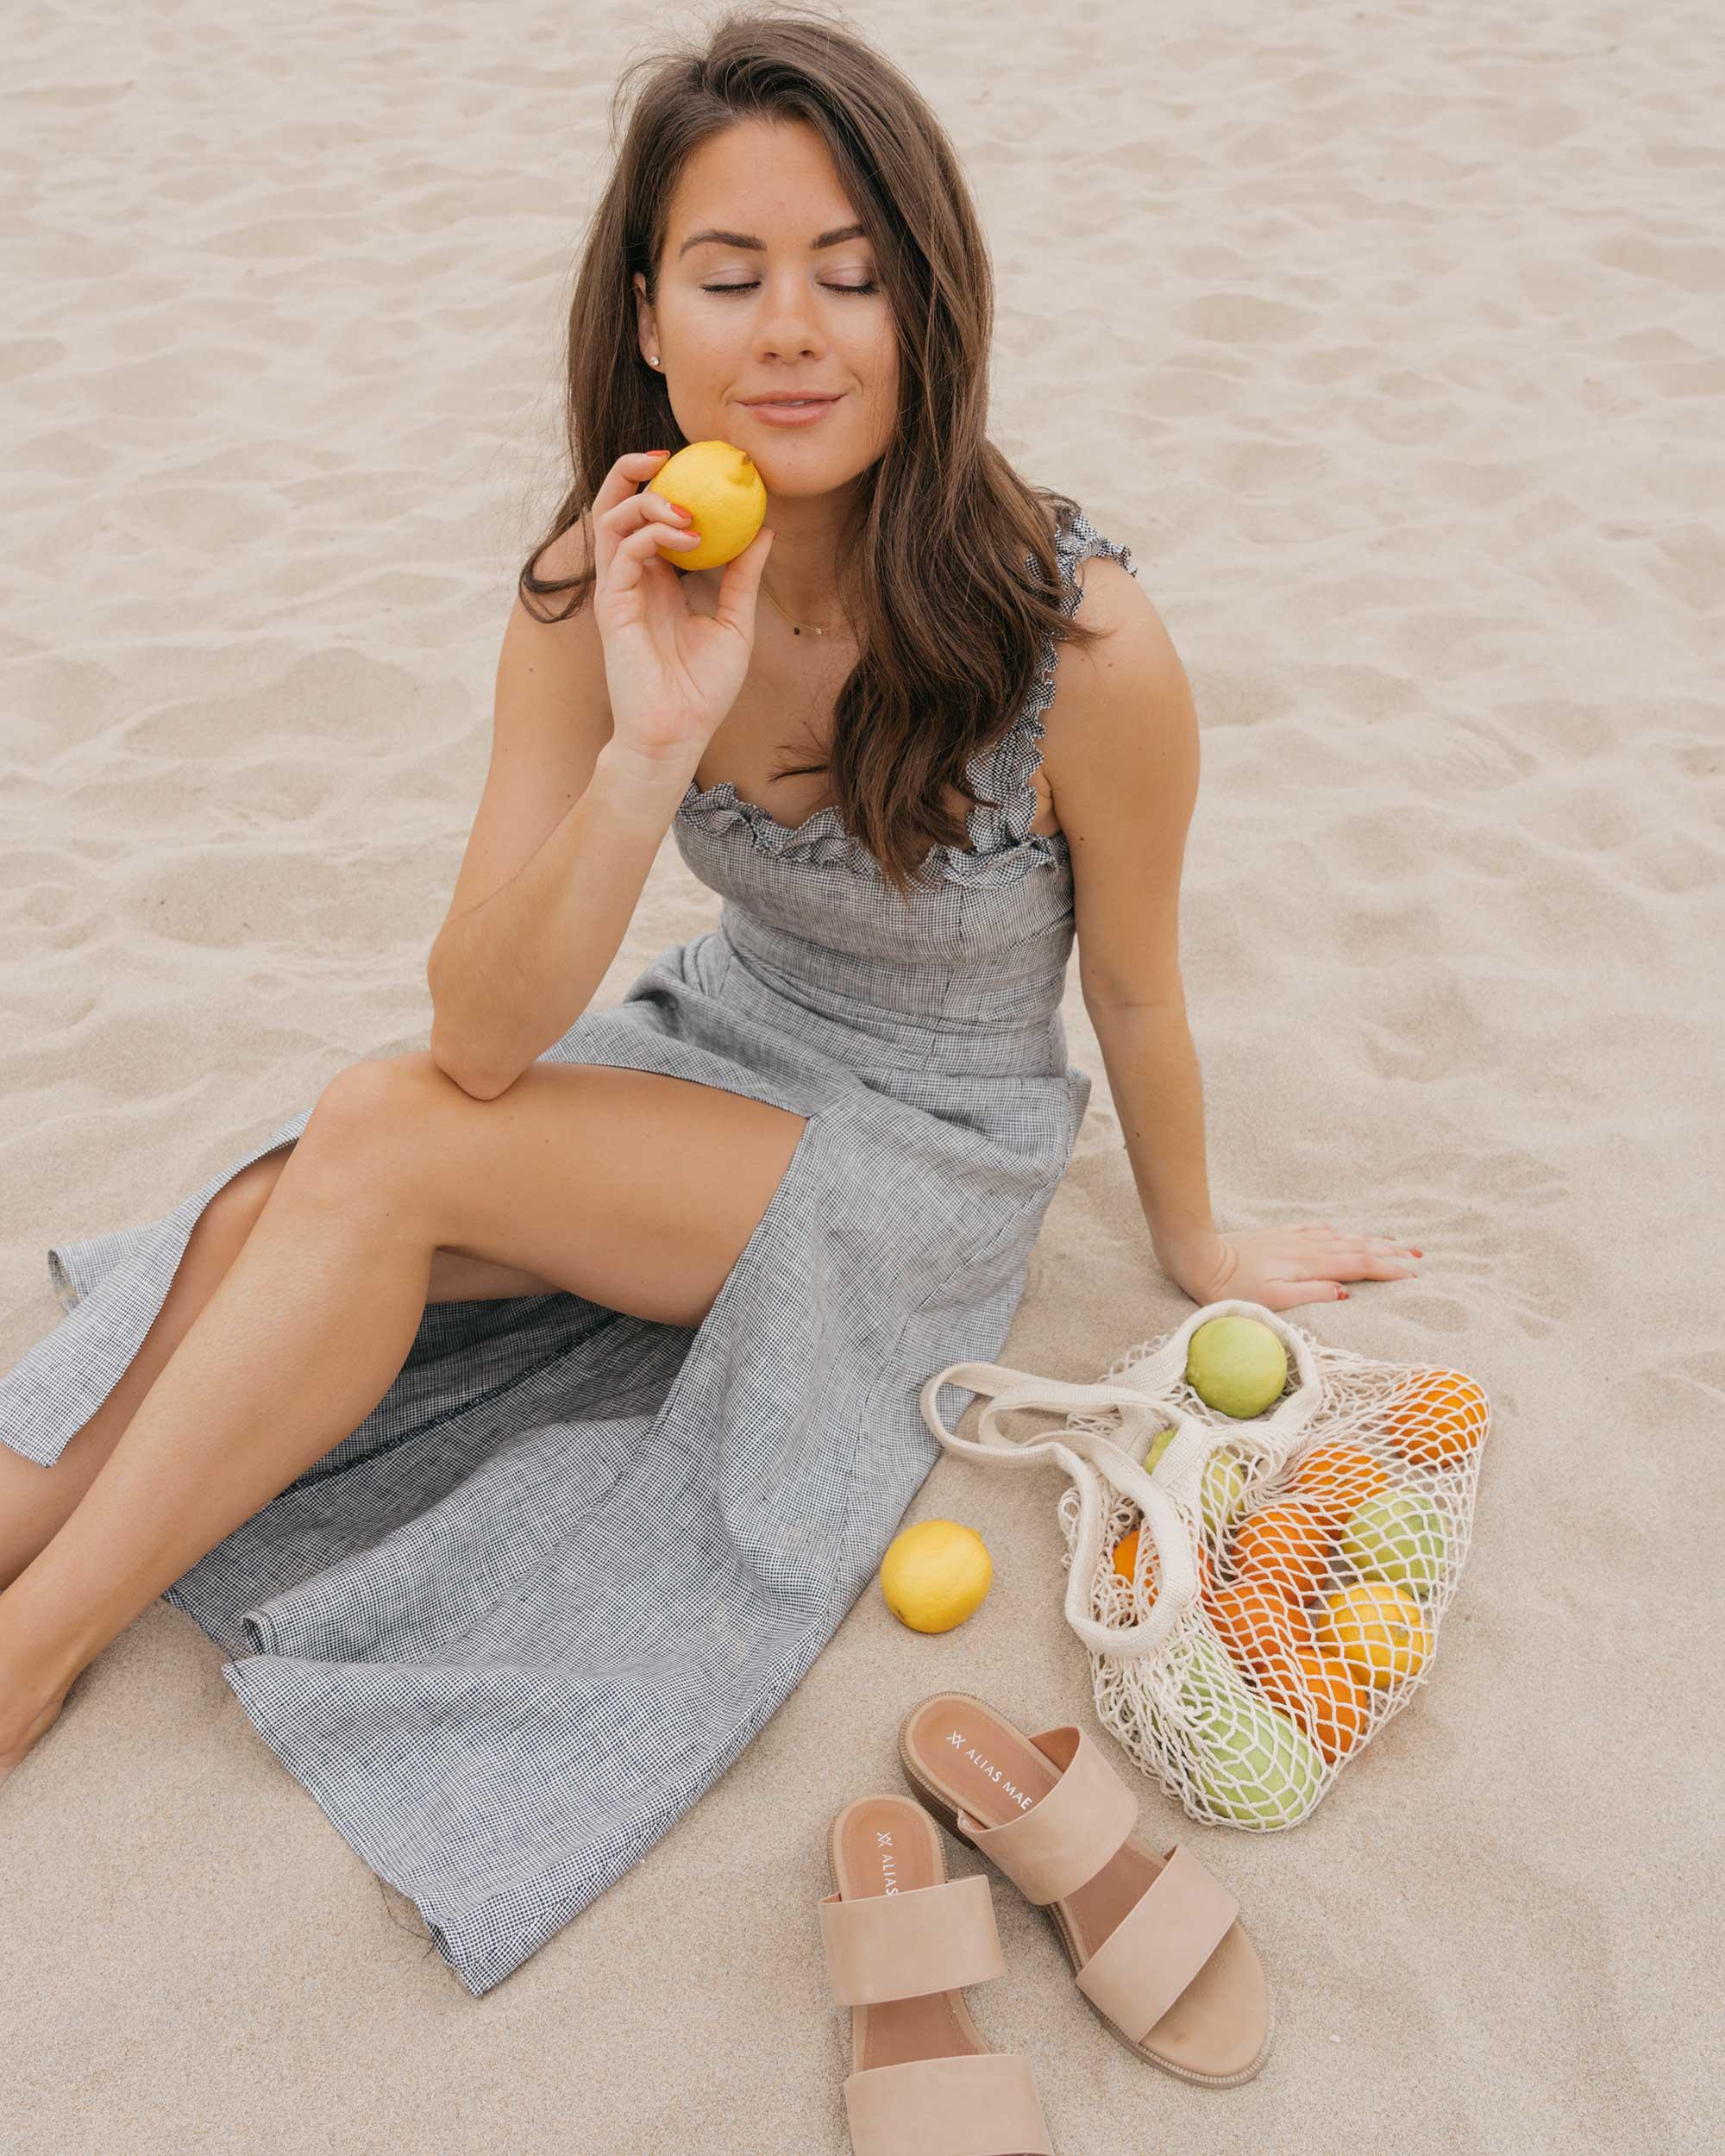 Reformation Lavendar Midi Dress Cotton Net Shopping Tote Newport Beach California Summer Outfit6.jpg